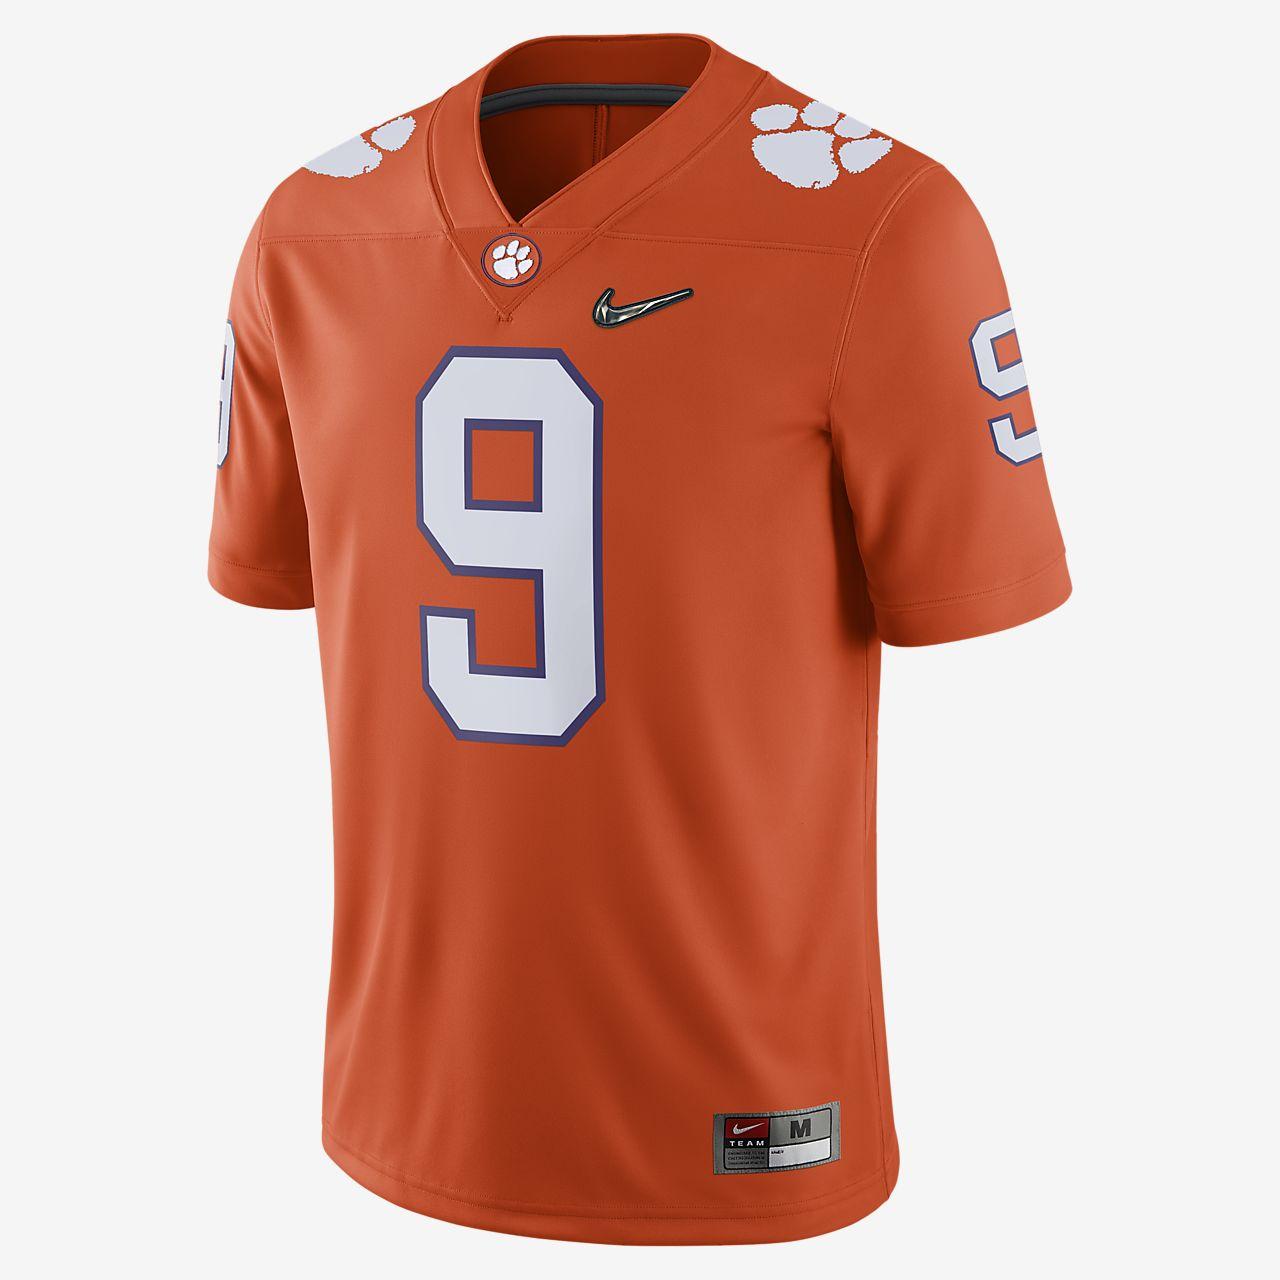 Nike National Championship Game Bound (Clemson) Men's Football Jersey